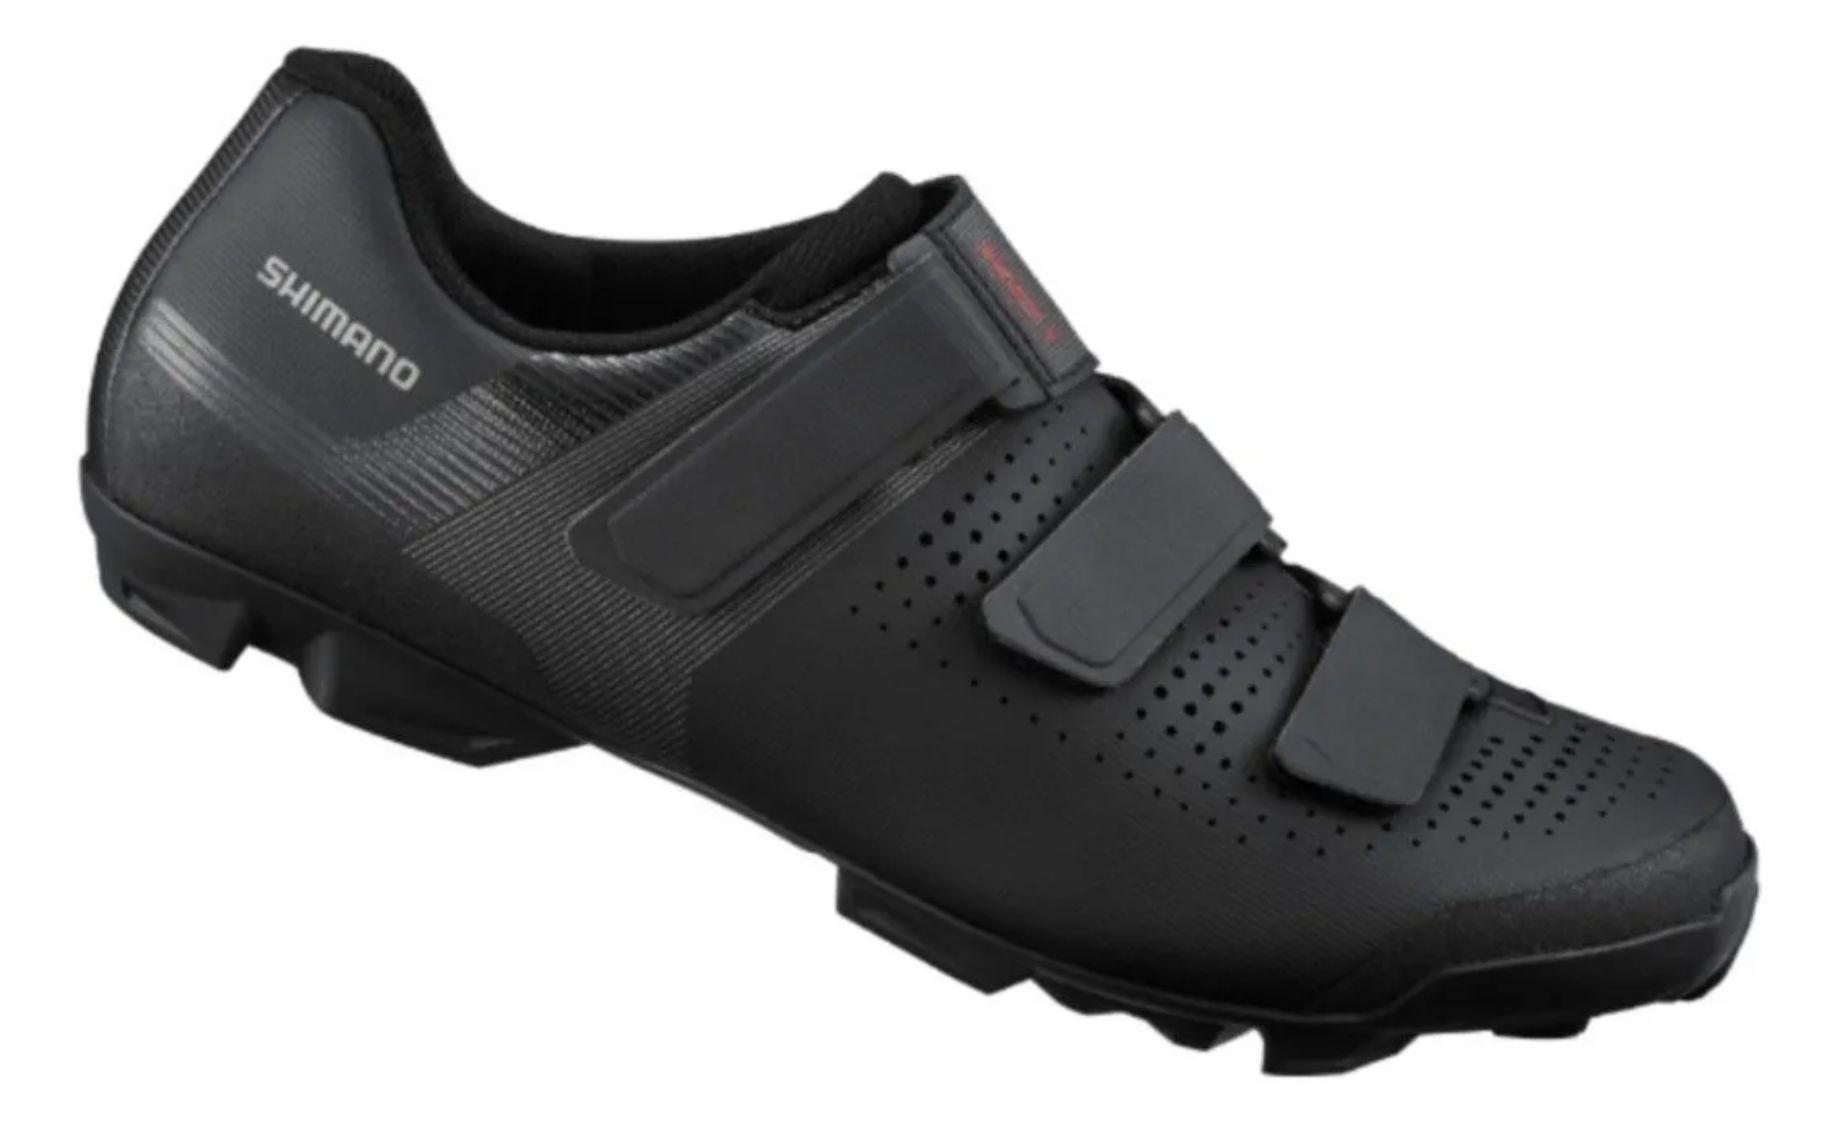 Sapatilha Shimano Xc1 Xc100 P/ Pedal Clip Ciclismo Mtb Preta